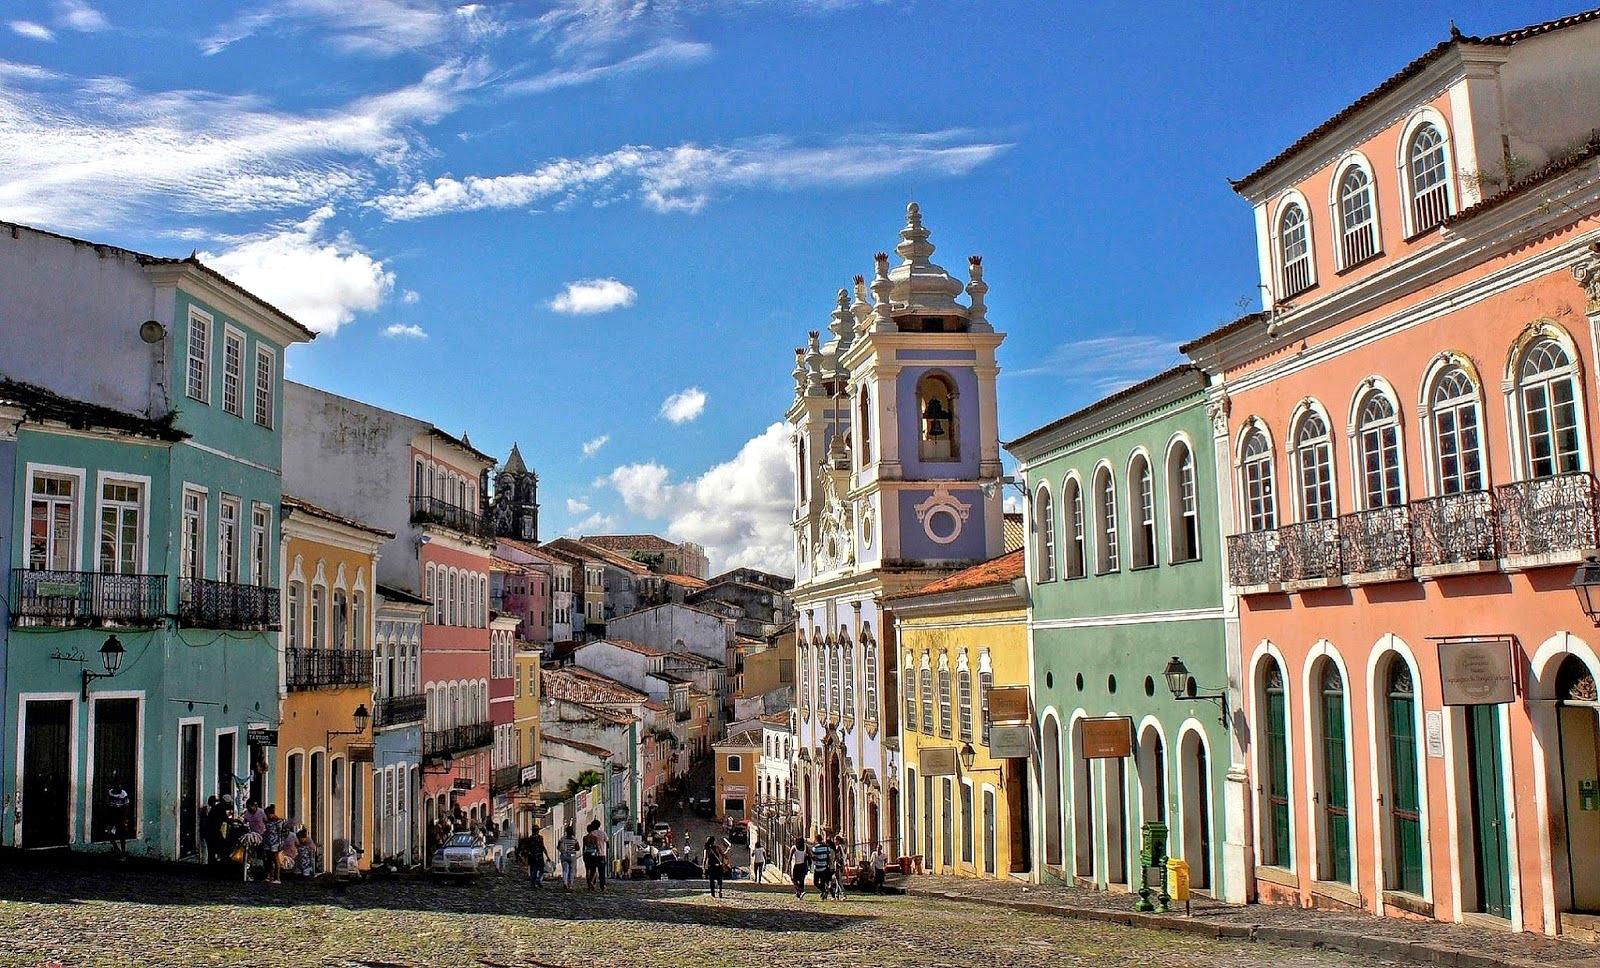 The old district Pelourinho in Salvador di Bahia